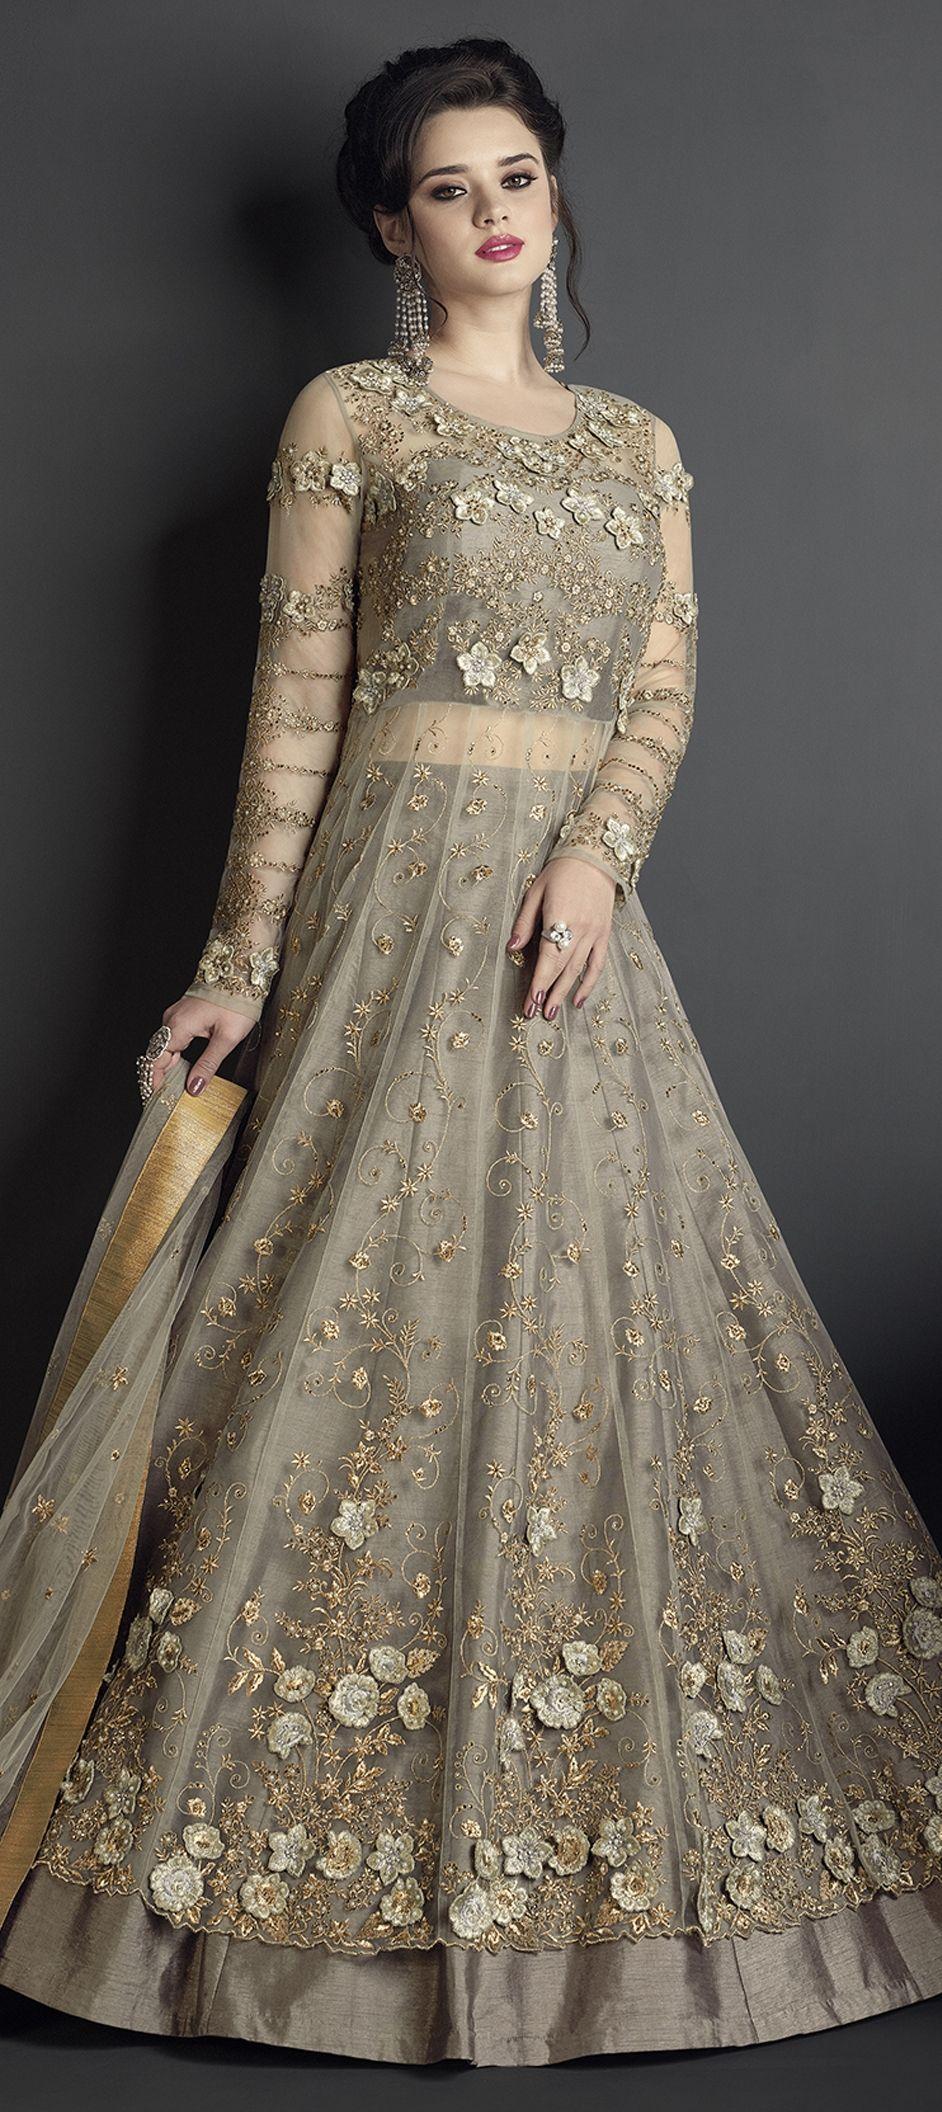 Simple Choli Wedding Cotton Bridal Blousedesigns Diy Saree Bridesmaid Saby Indian Gowns Dresses Indian Bridal Wear Party Wear Indian Dresses [ 2112 x 942 Pixel ]